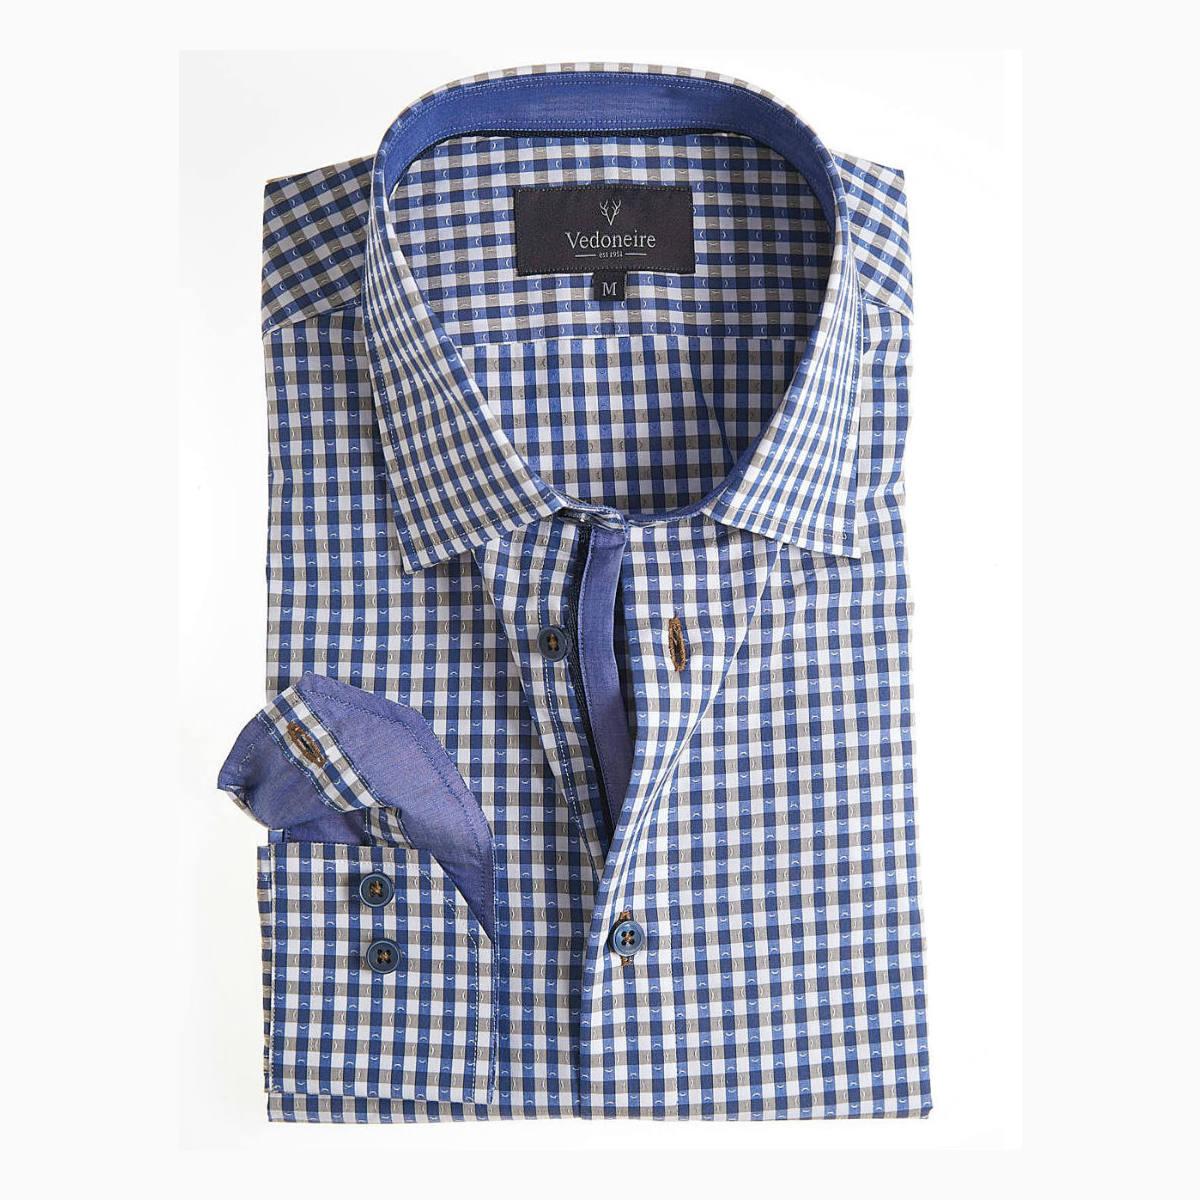 Vedoneire Dobby Blue shirt check